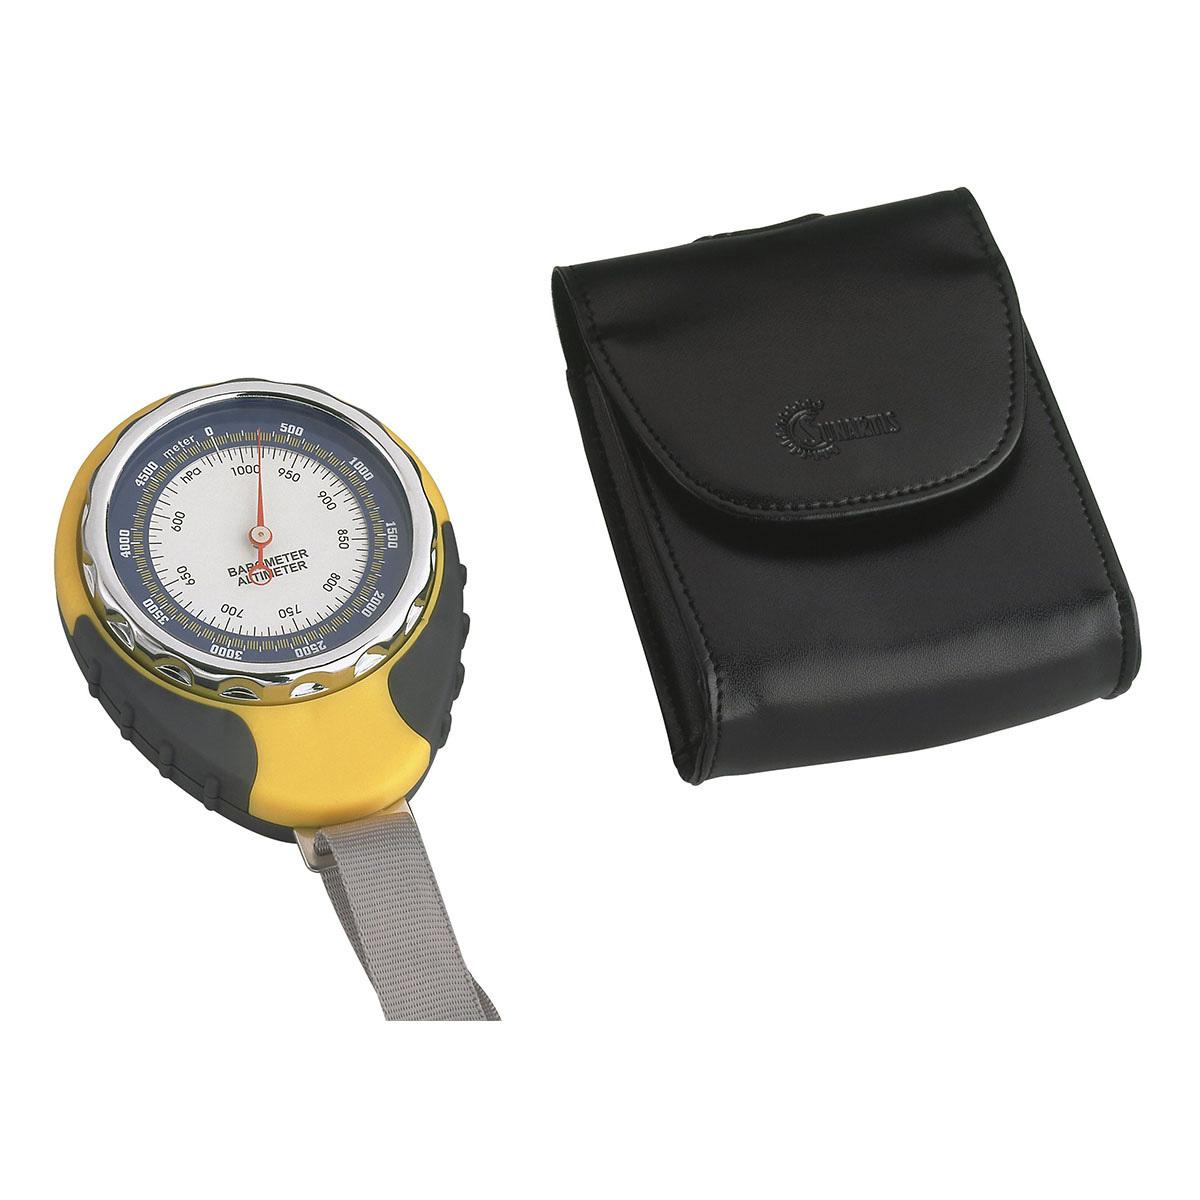 42-4000-höhenmesser-hitrax-globe-set-1200x1200px.jpg